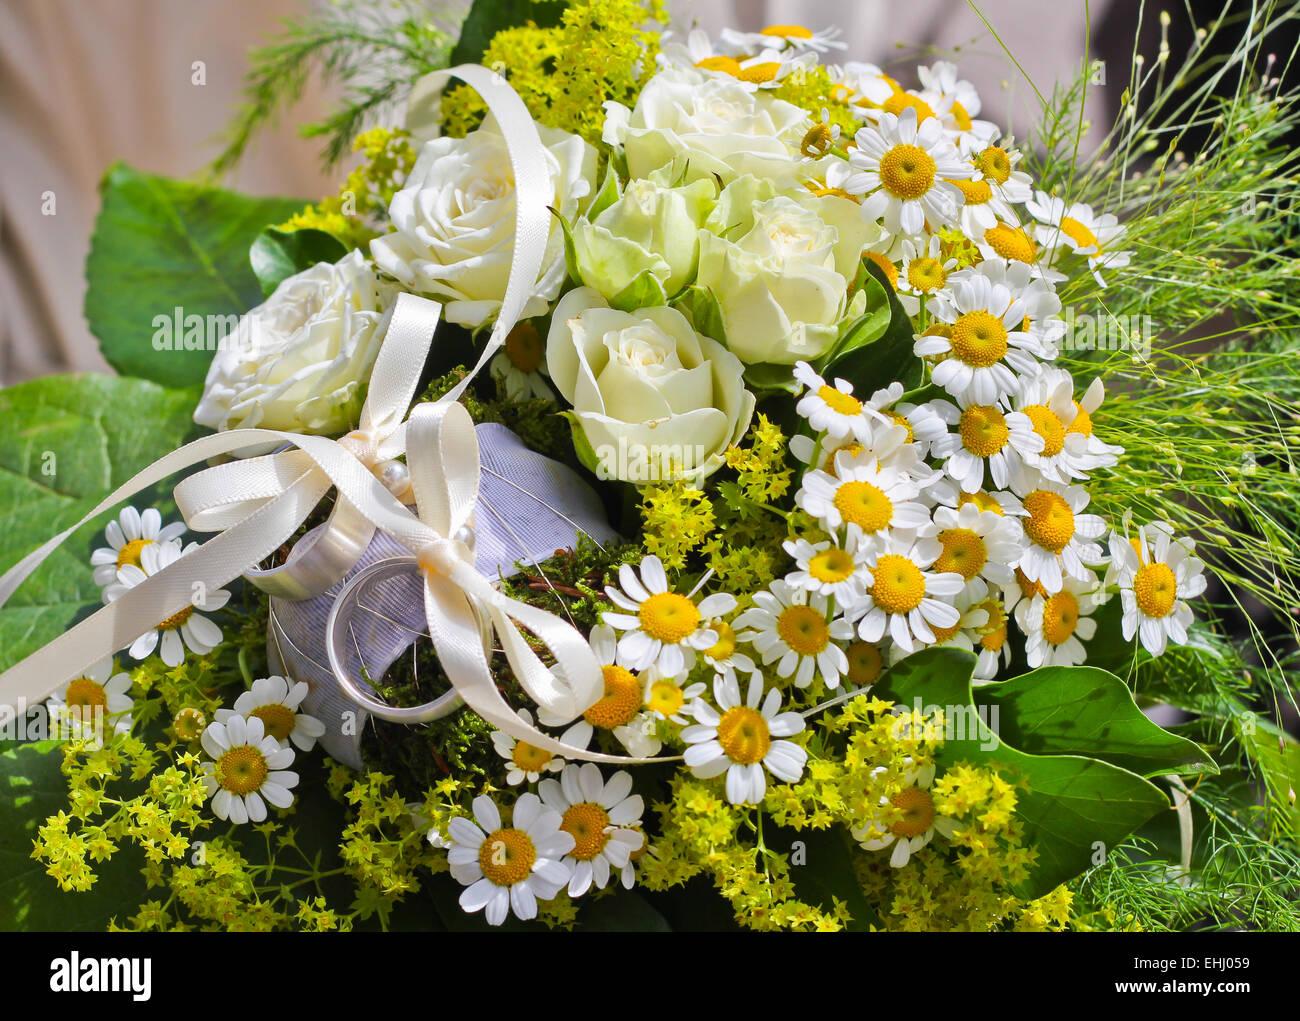 Weddingflowers - Stock Image